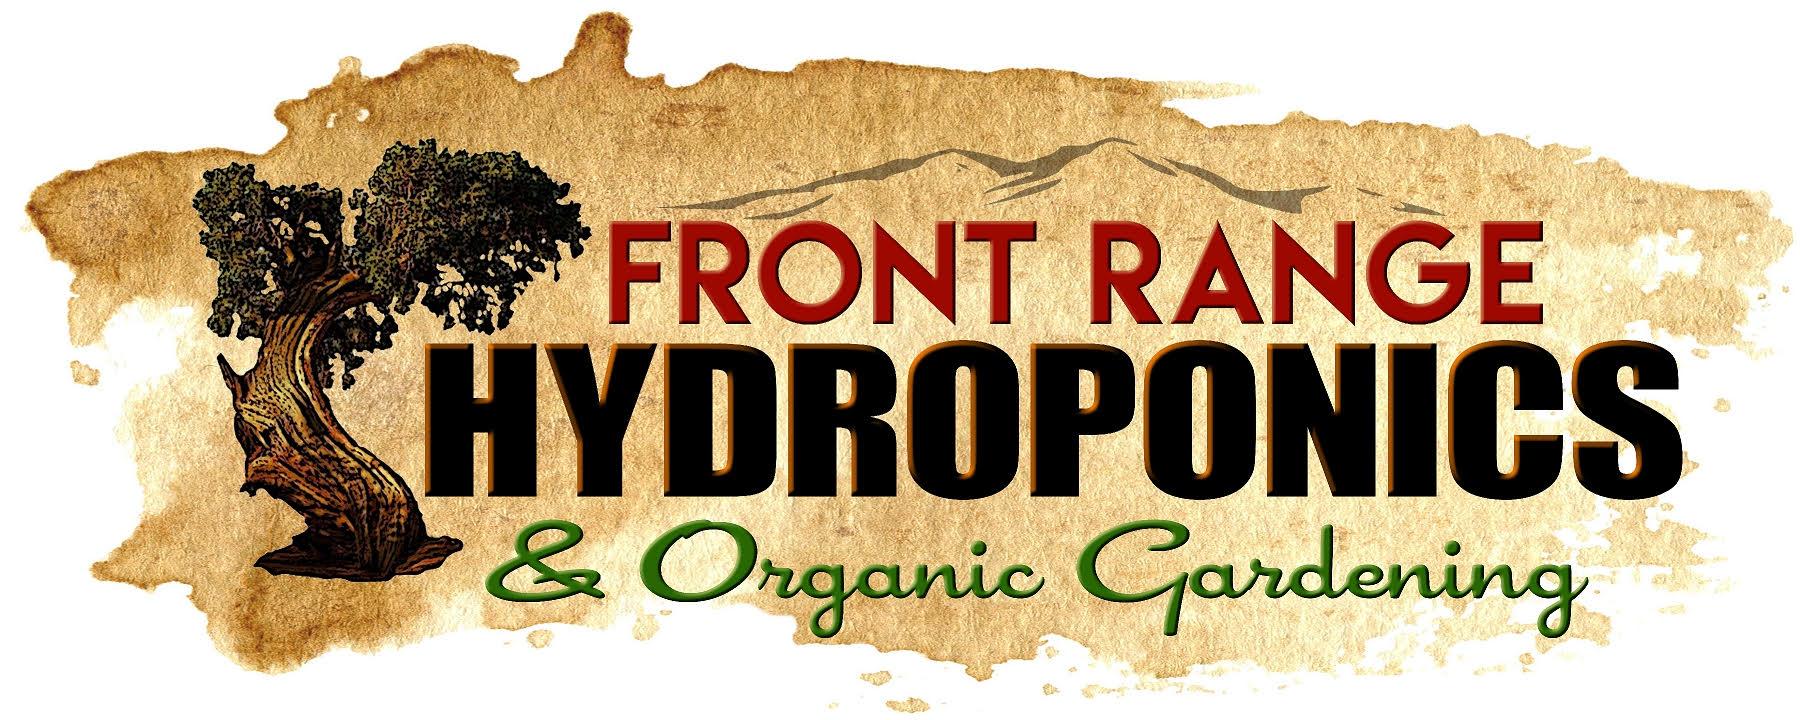 Front Range Hydroponics